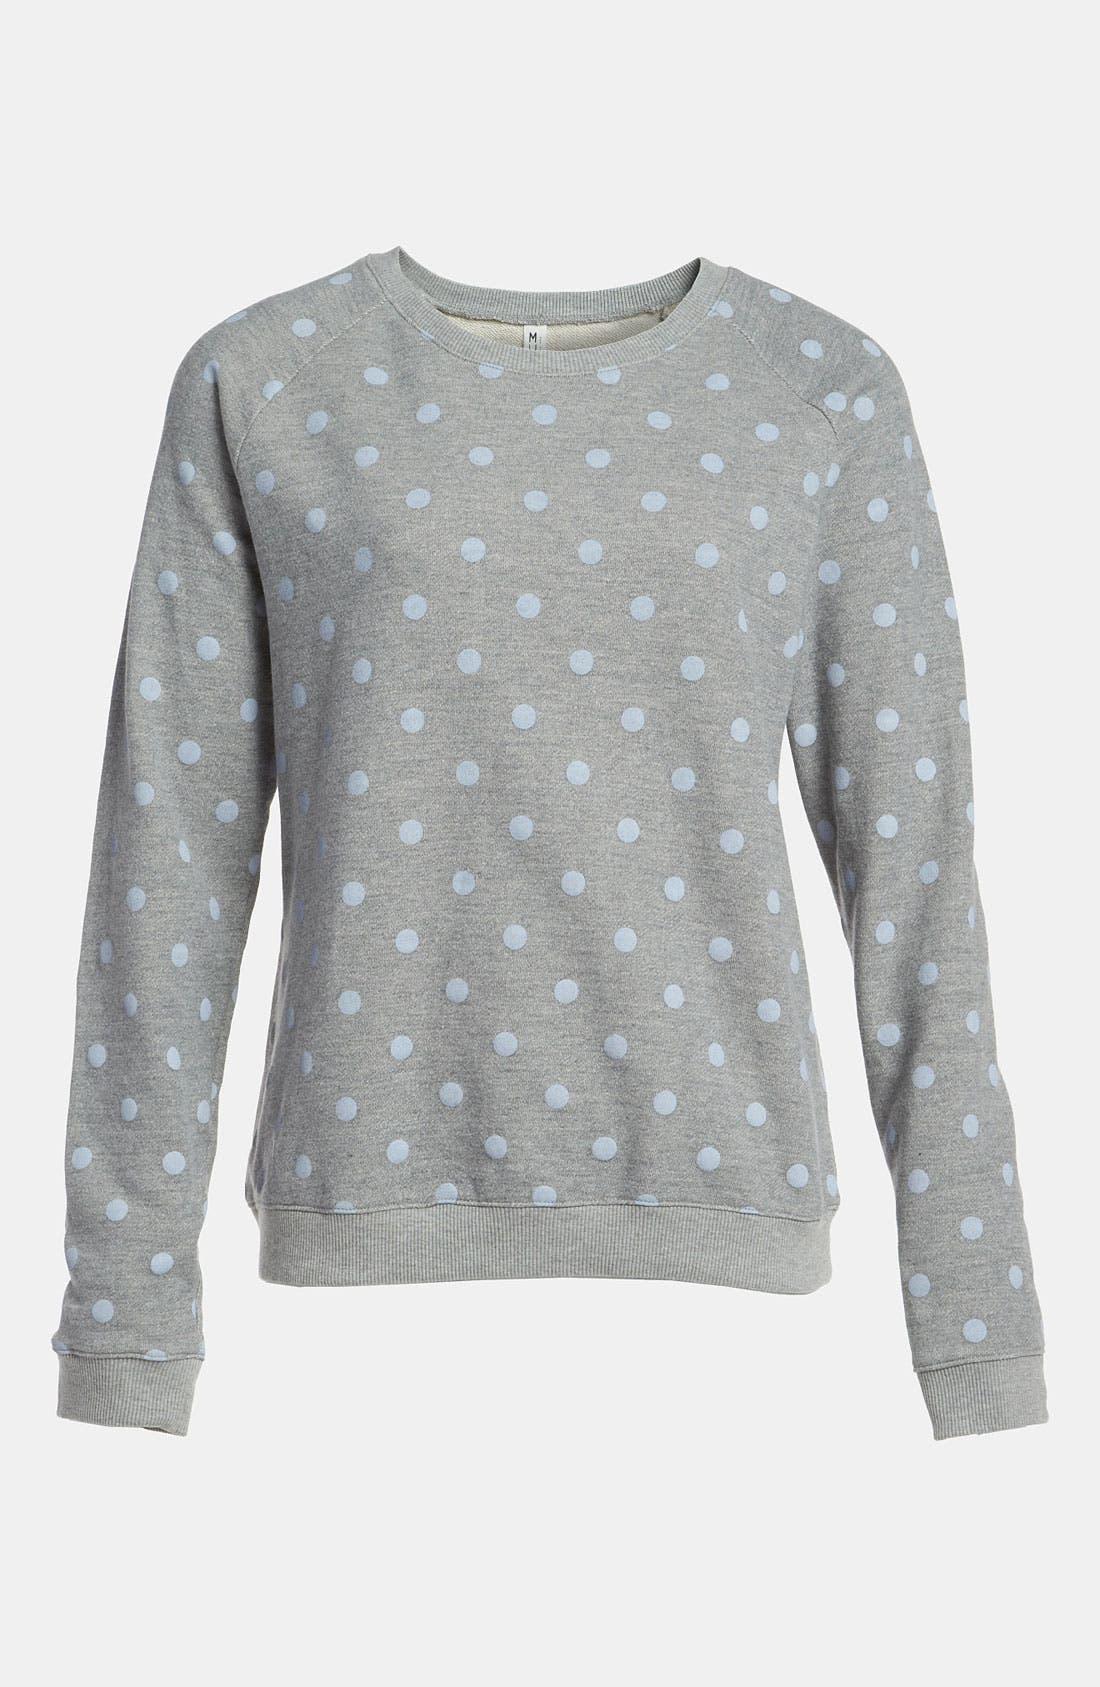 Alternate Image 1 Selected - Mural Polka Dot Sweatshirt